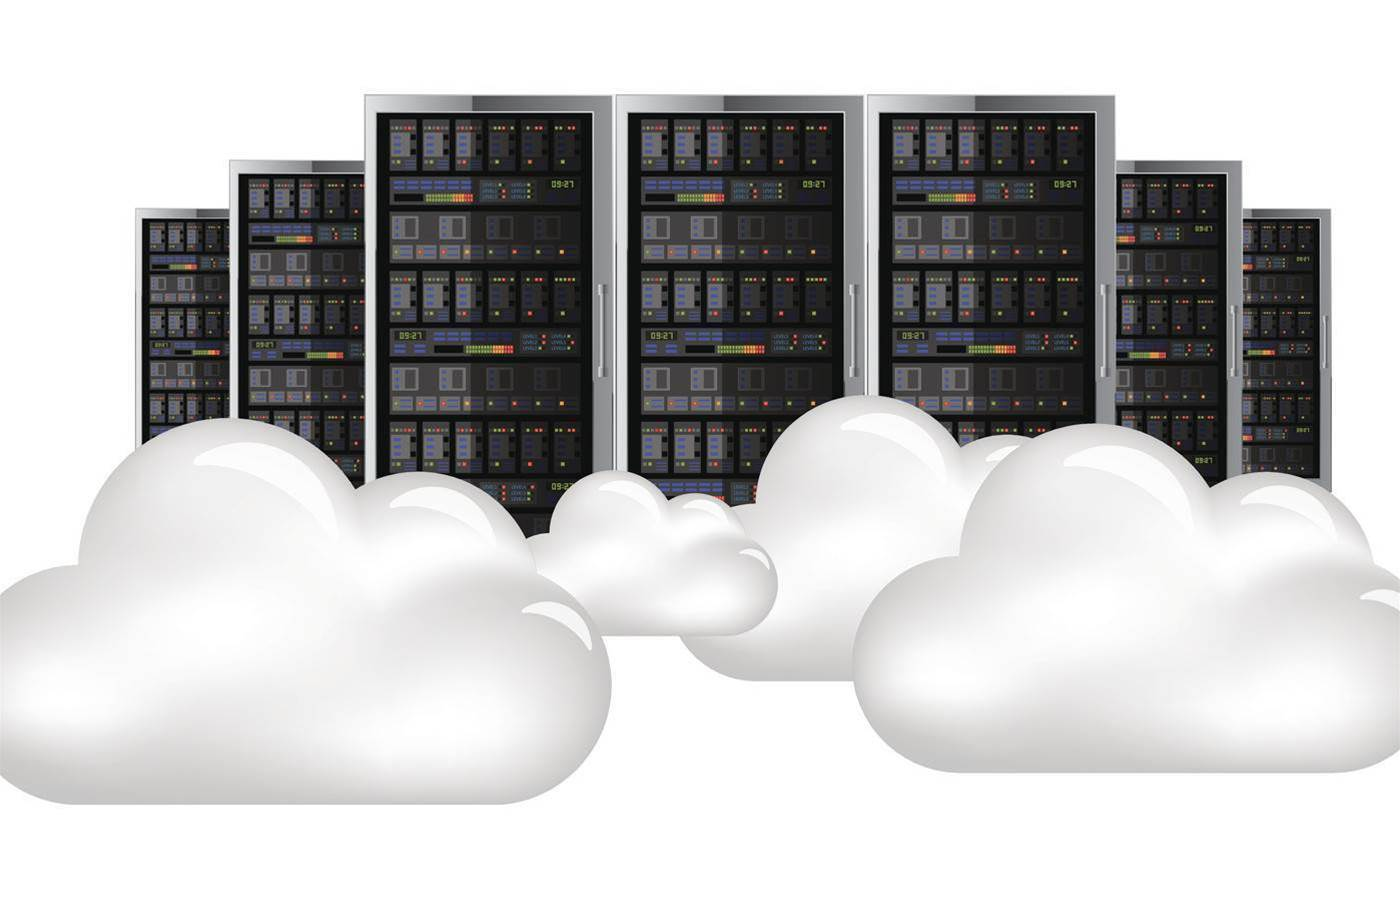 Azure, Google Cloud make gains on AWS in global cloud market